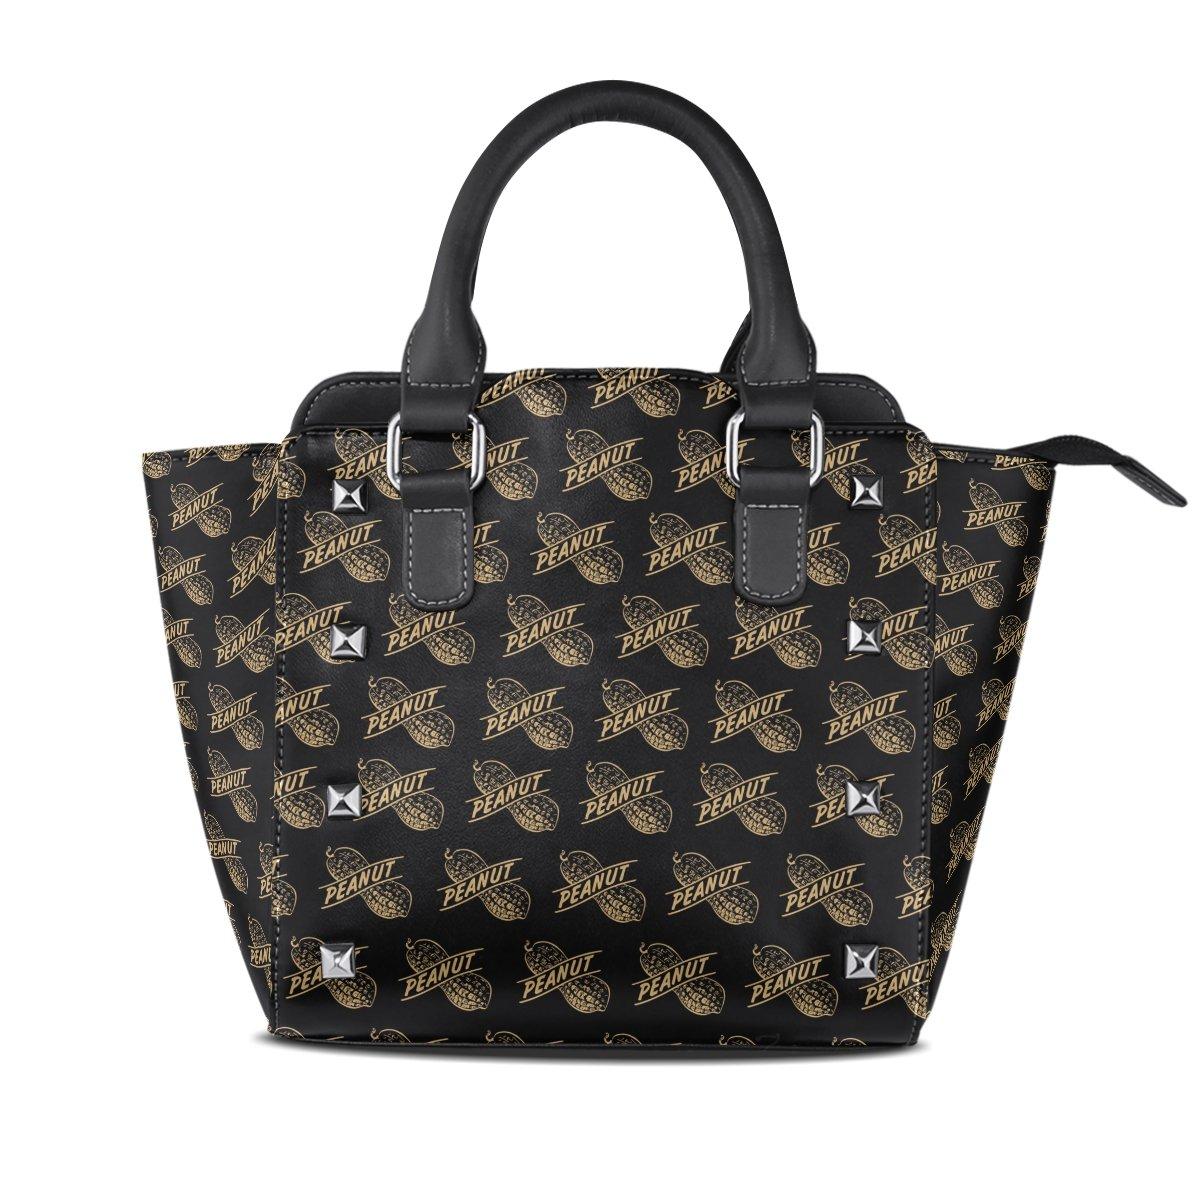 Jennifer PU Leather Top-Handle Handbags Amazing Cute Peanut Pattern Single-Shoulder Tote Crossbody Bag Messenger Bags For Women